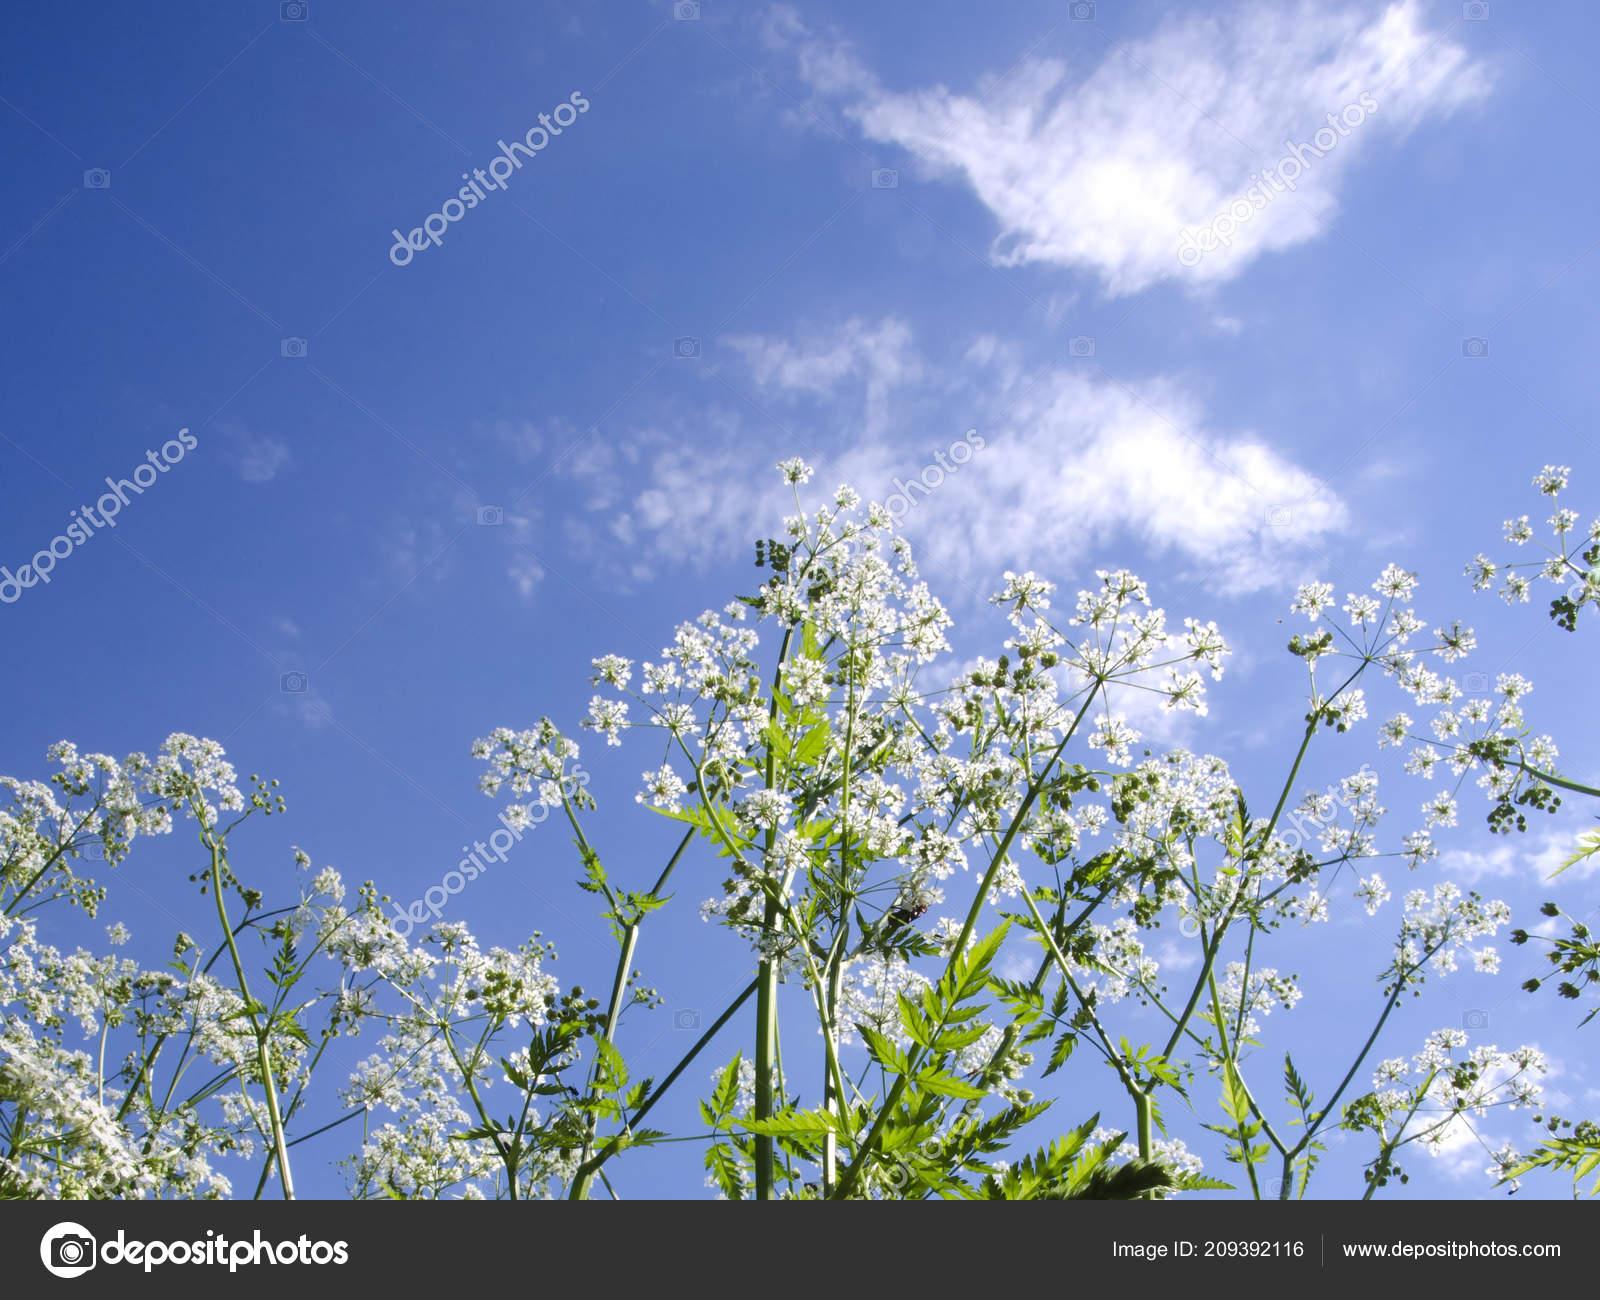 field flowers white flowers sky background ストック写真